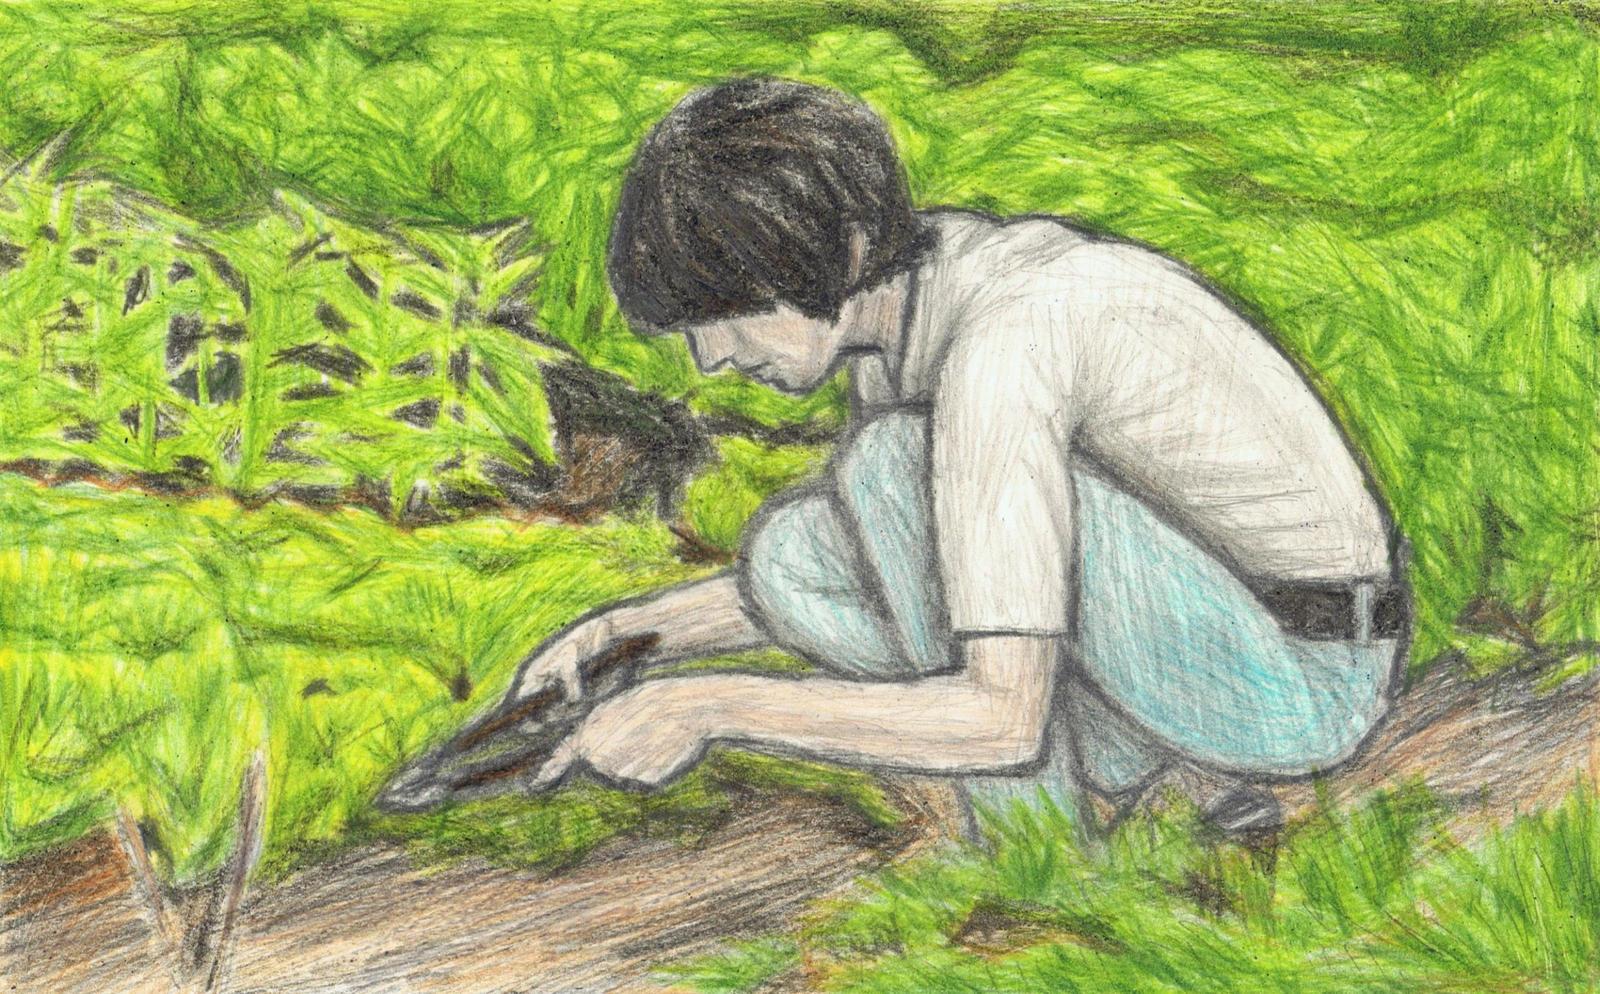 George Harrison the gardener by gagambo